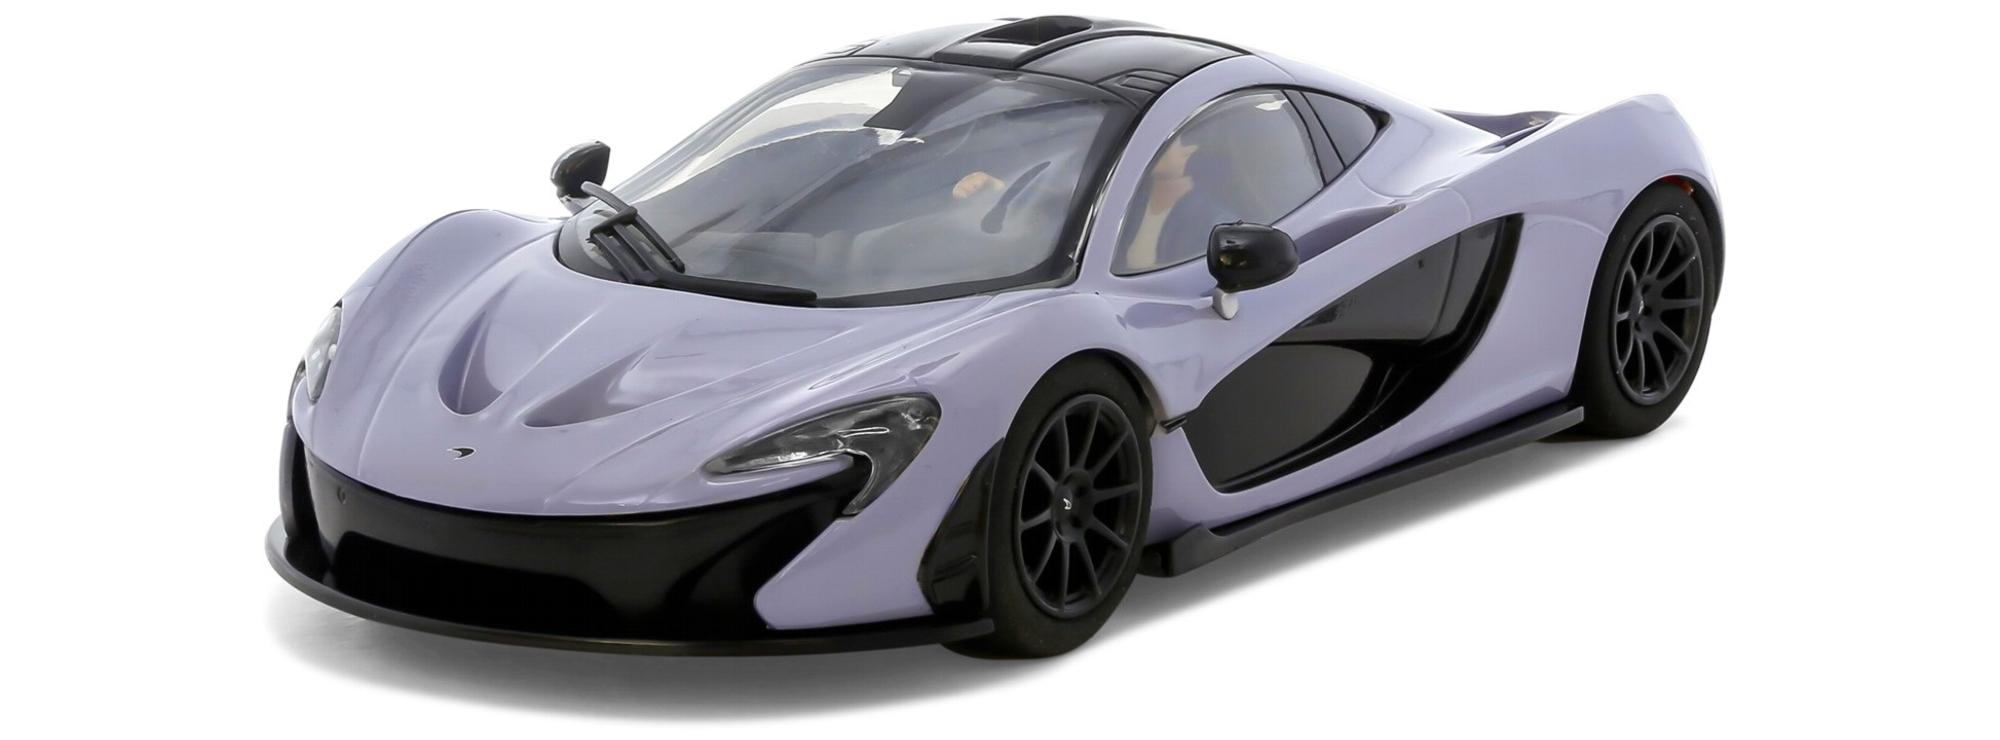 ausverkauft | scalextric 3877 mclaren p1, grau | slot car 1:32